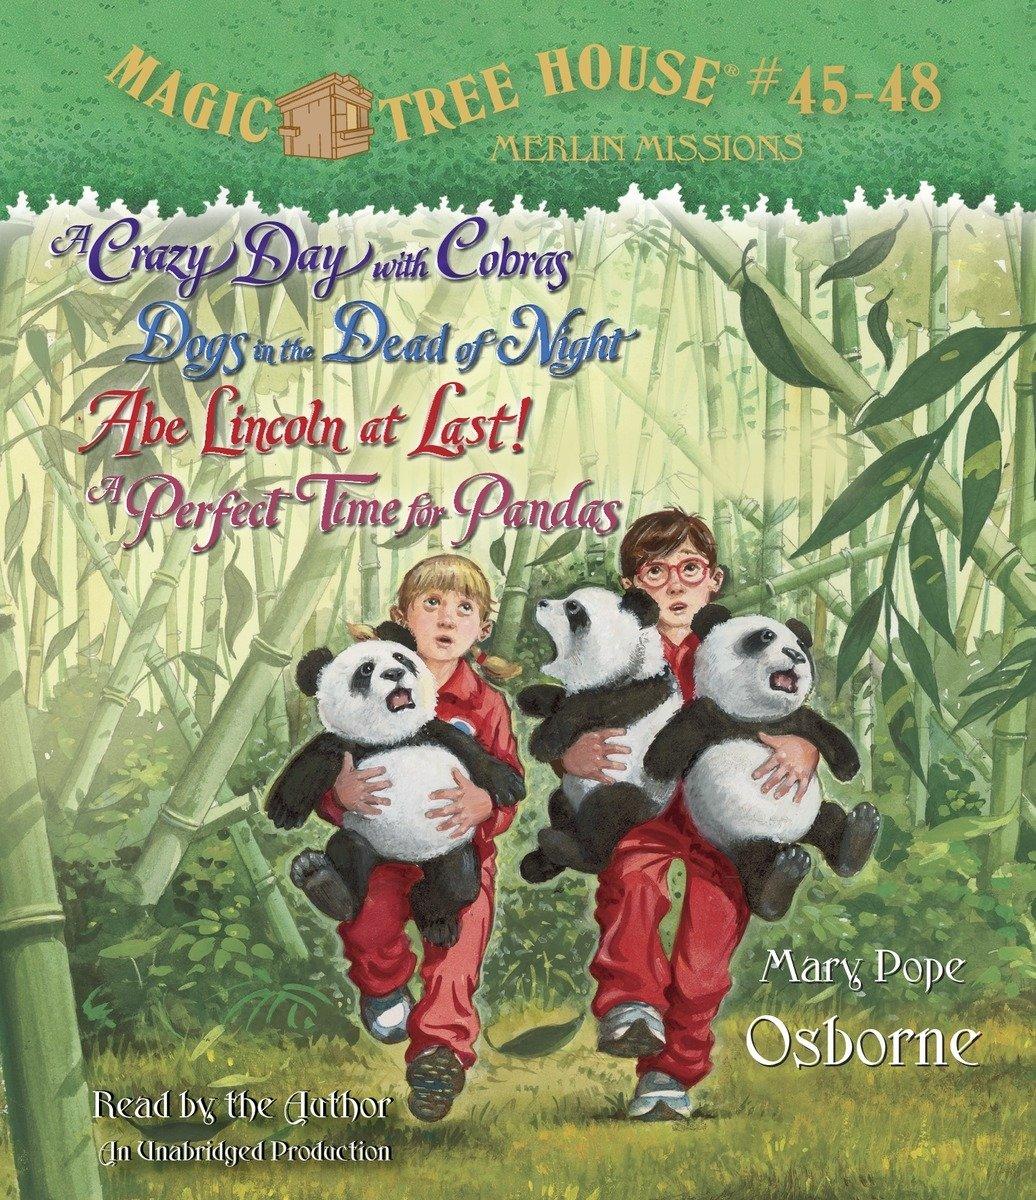 Magic Tree House Collection Books 45 48 Mary Pope Osborne